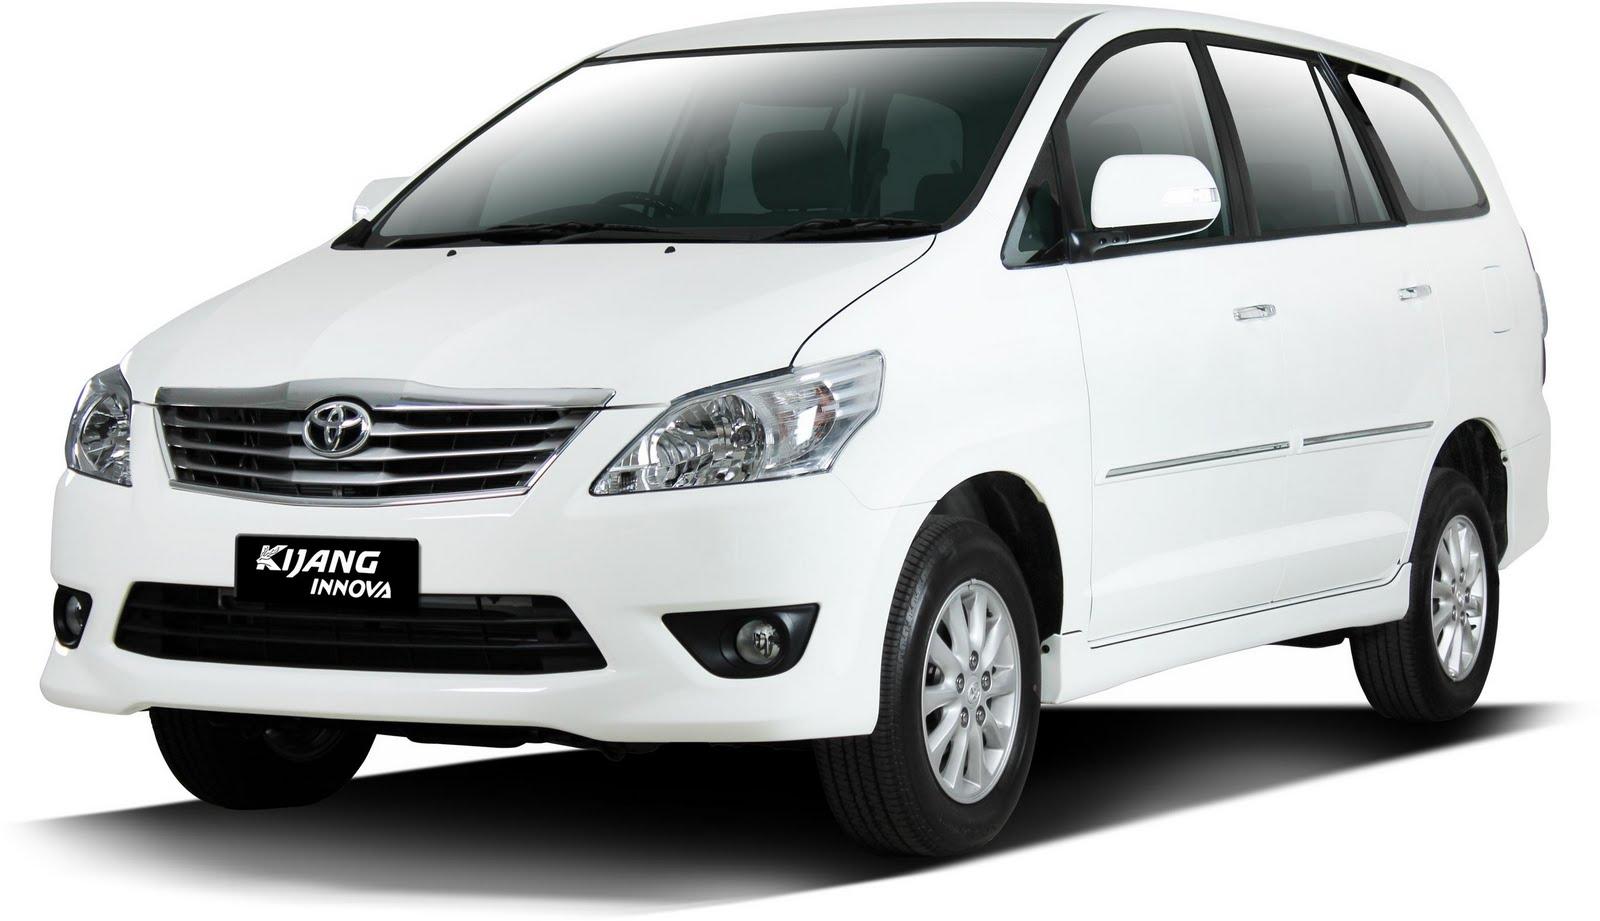 Konsumsi Bbm All New Kijang Innova Diesel Kekurangan Grand Veloz Grosir Toyota